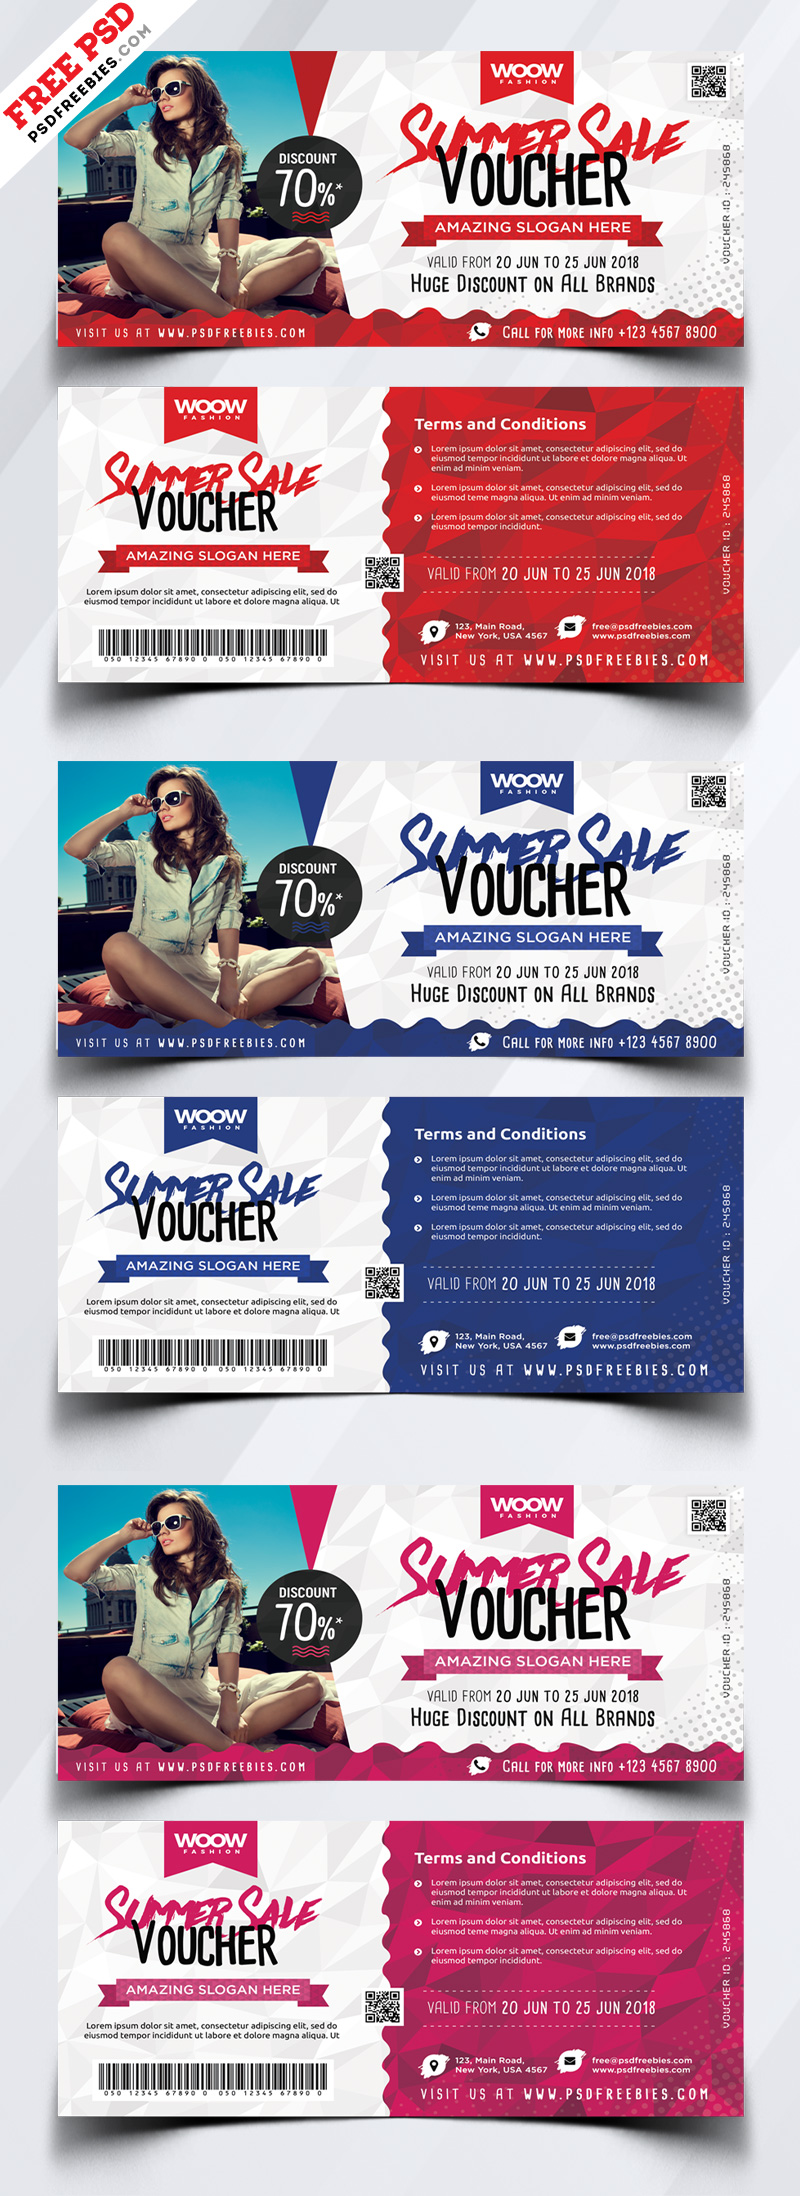 Summer Sale Discount Voucher Free PSD Bundle